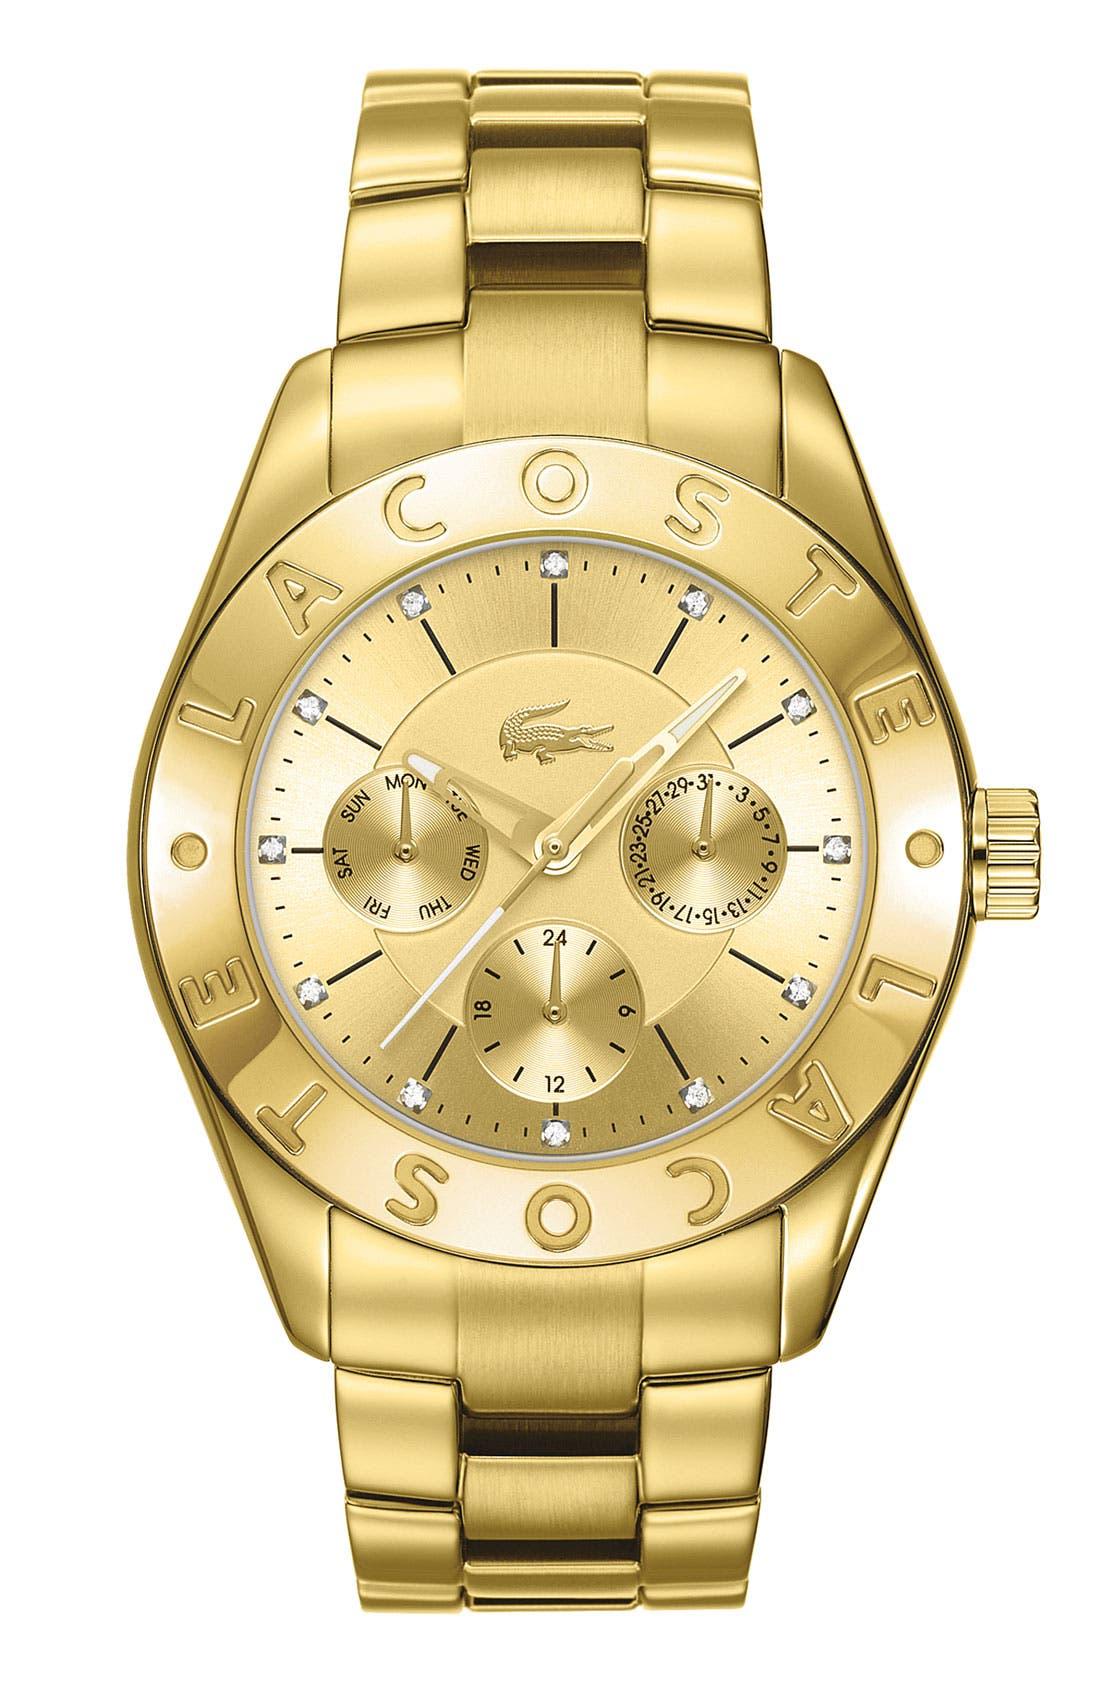 Alternate Image 1 Selected - Lacoste 'Biarritz' Logo Bezel Bracelet Watch, 38mm